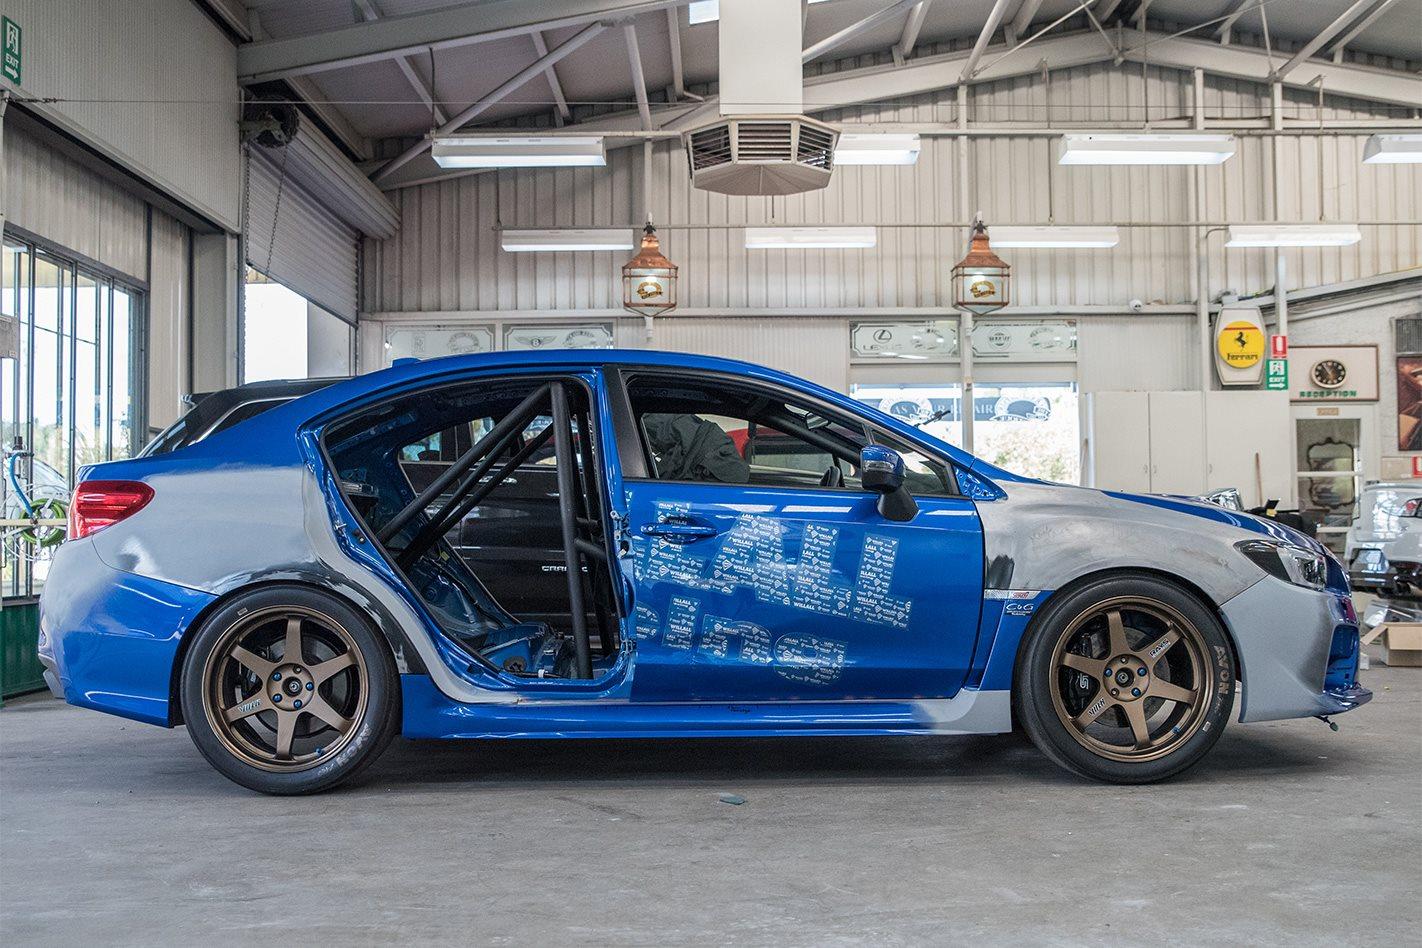 Willall Subaru WRX STI 25BB profile